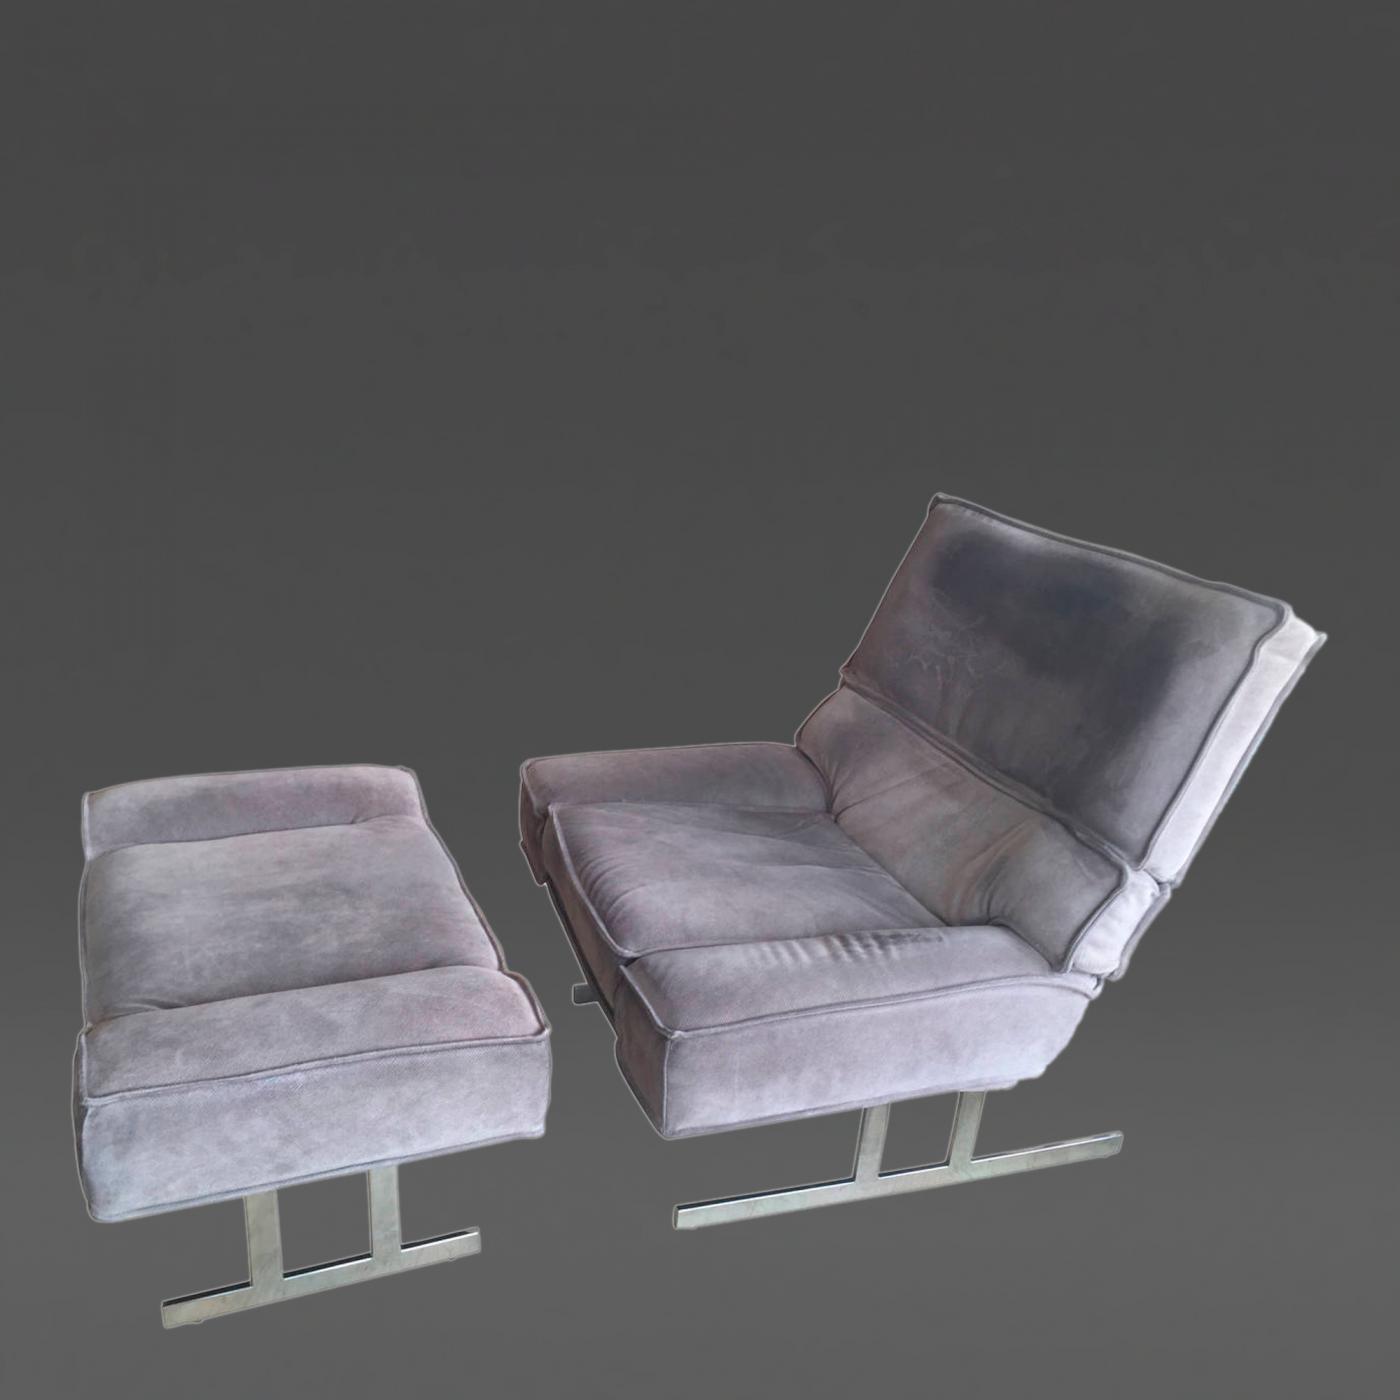 Milo Baughman Oversized Milo Baughman Reclining Lounge Chair and Ottoman